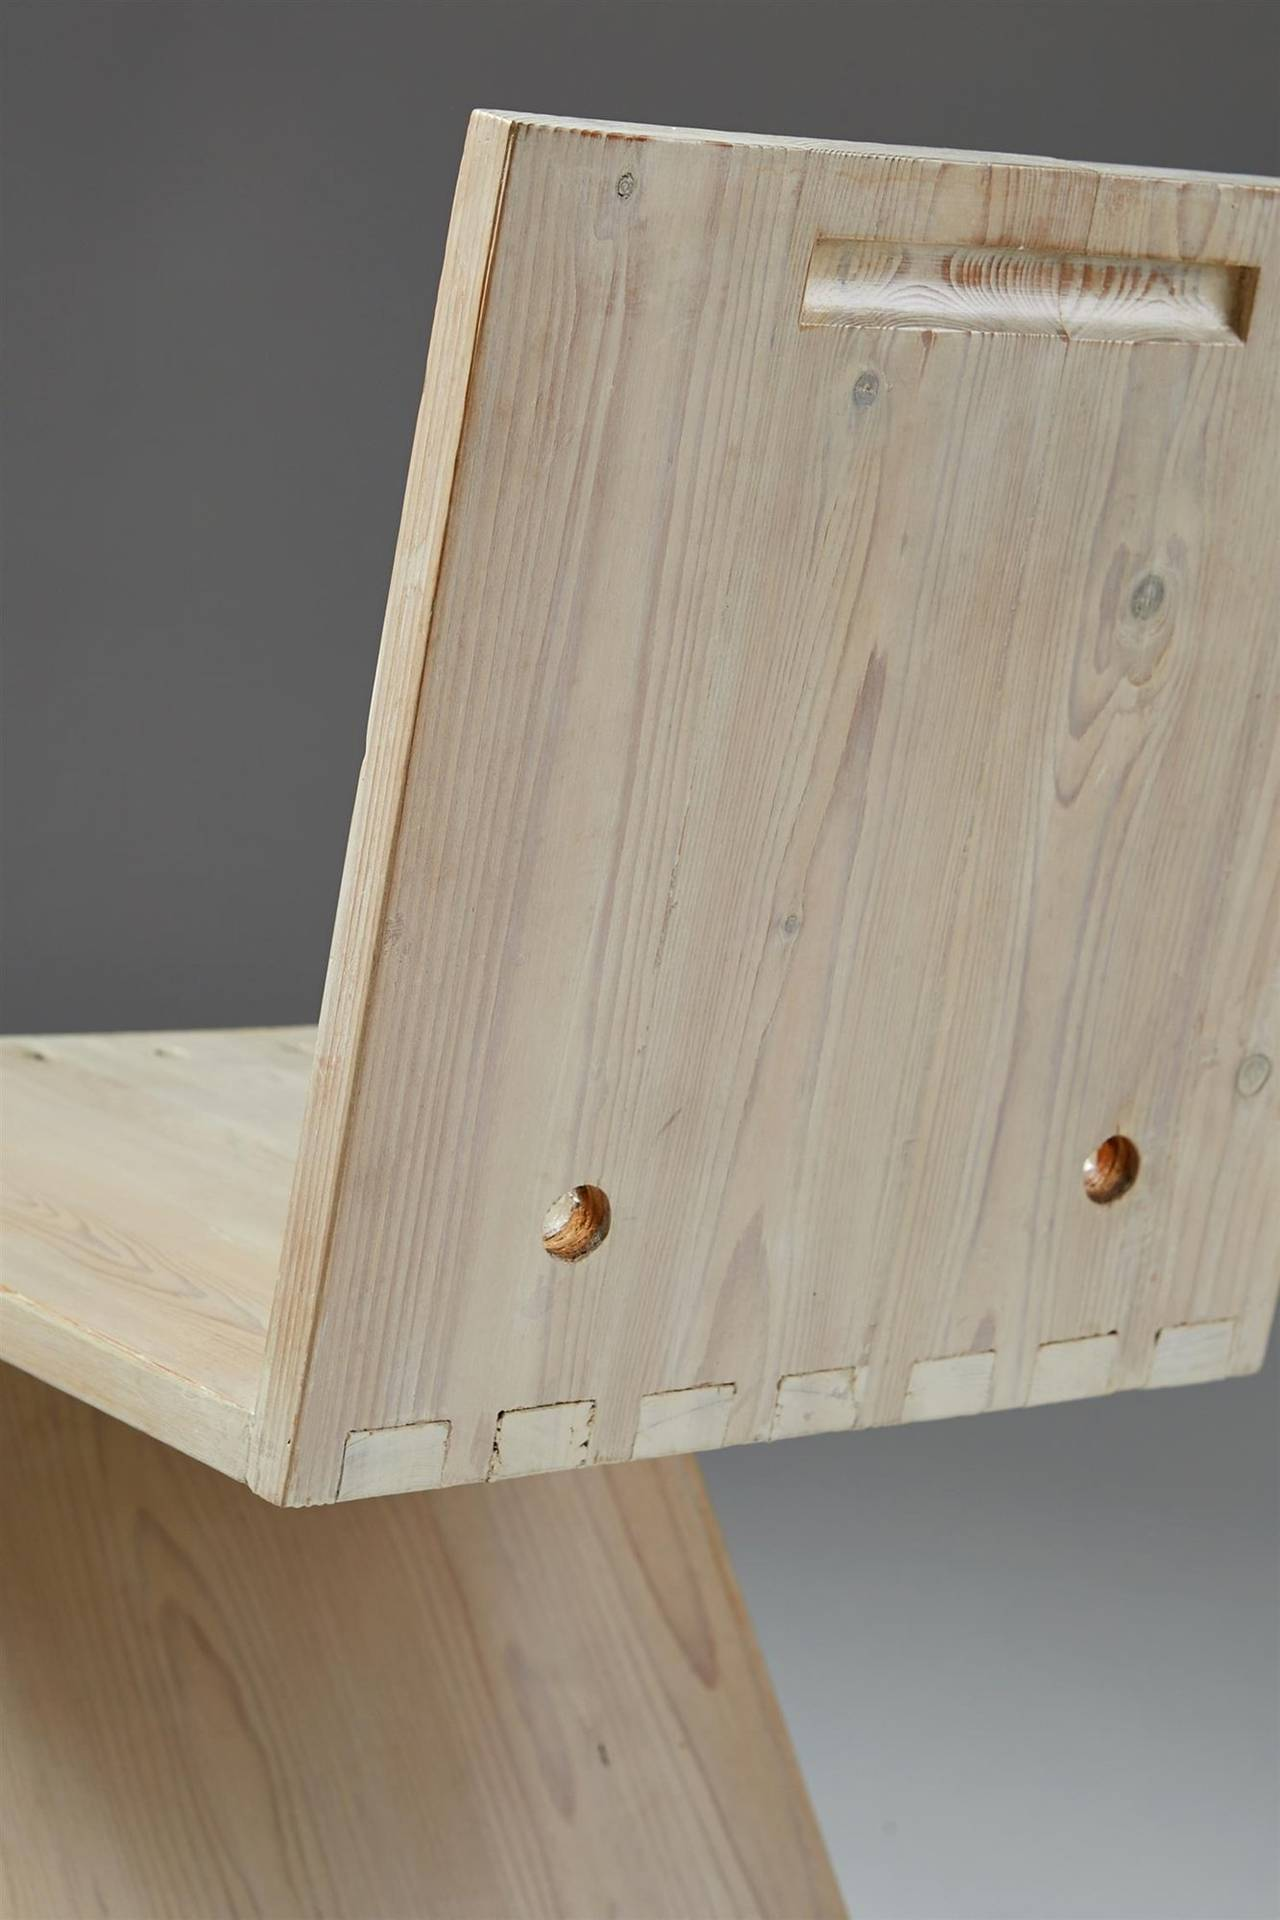 Zig Zag Chair Designed by Gerrit Rietveld for G.A. van de Groenekan, Holland 3